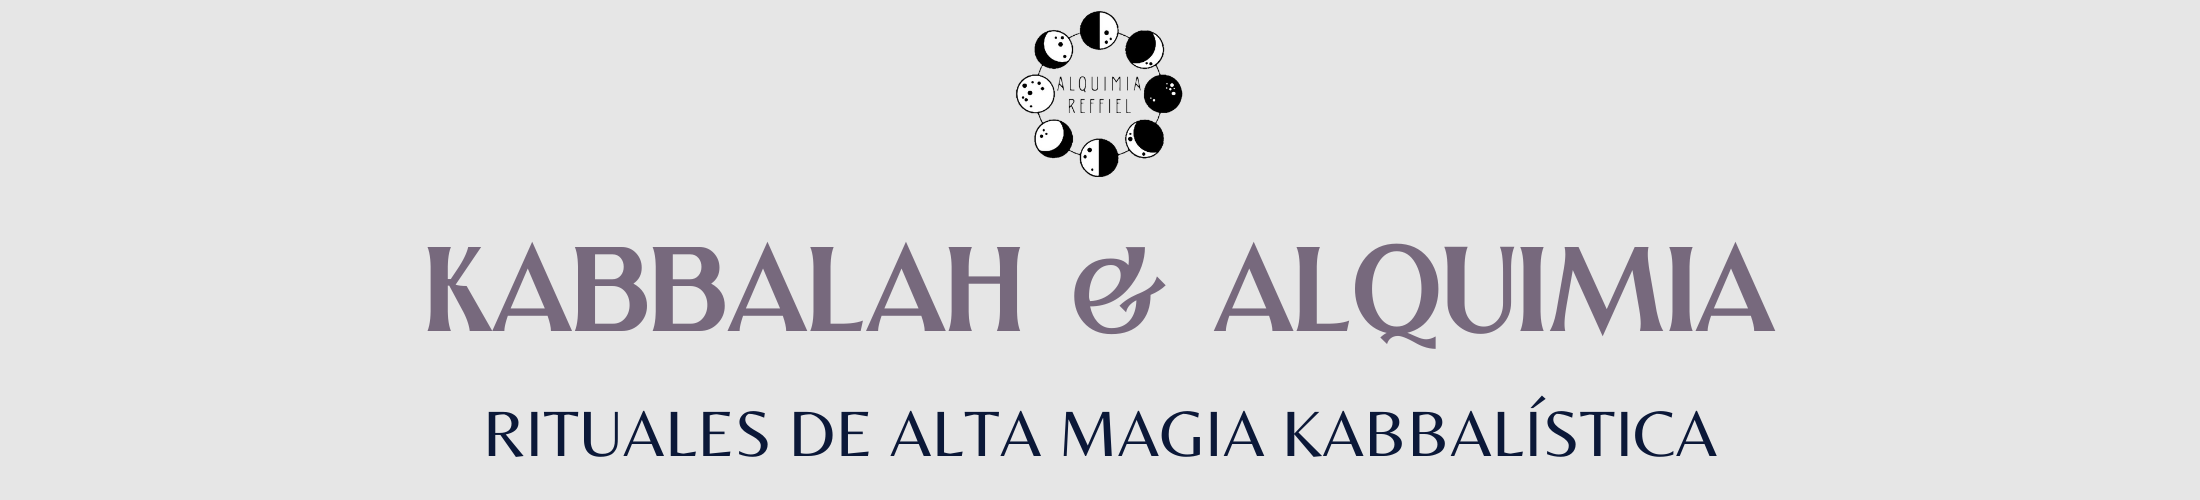 Copia de Copia de KABBALAH & ALQUIMIA (3)